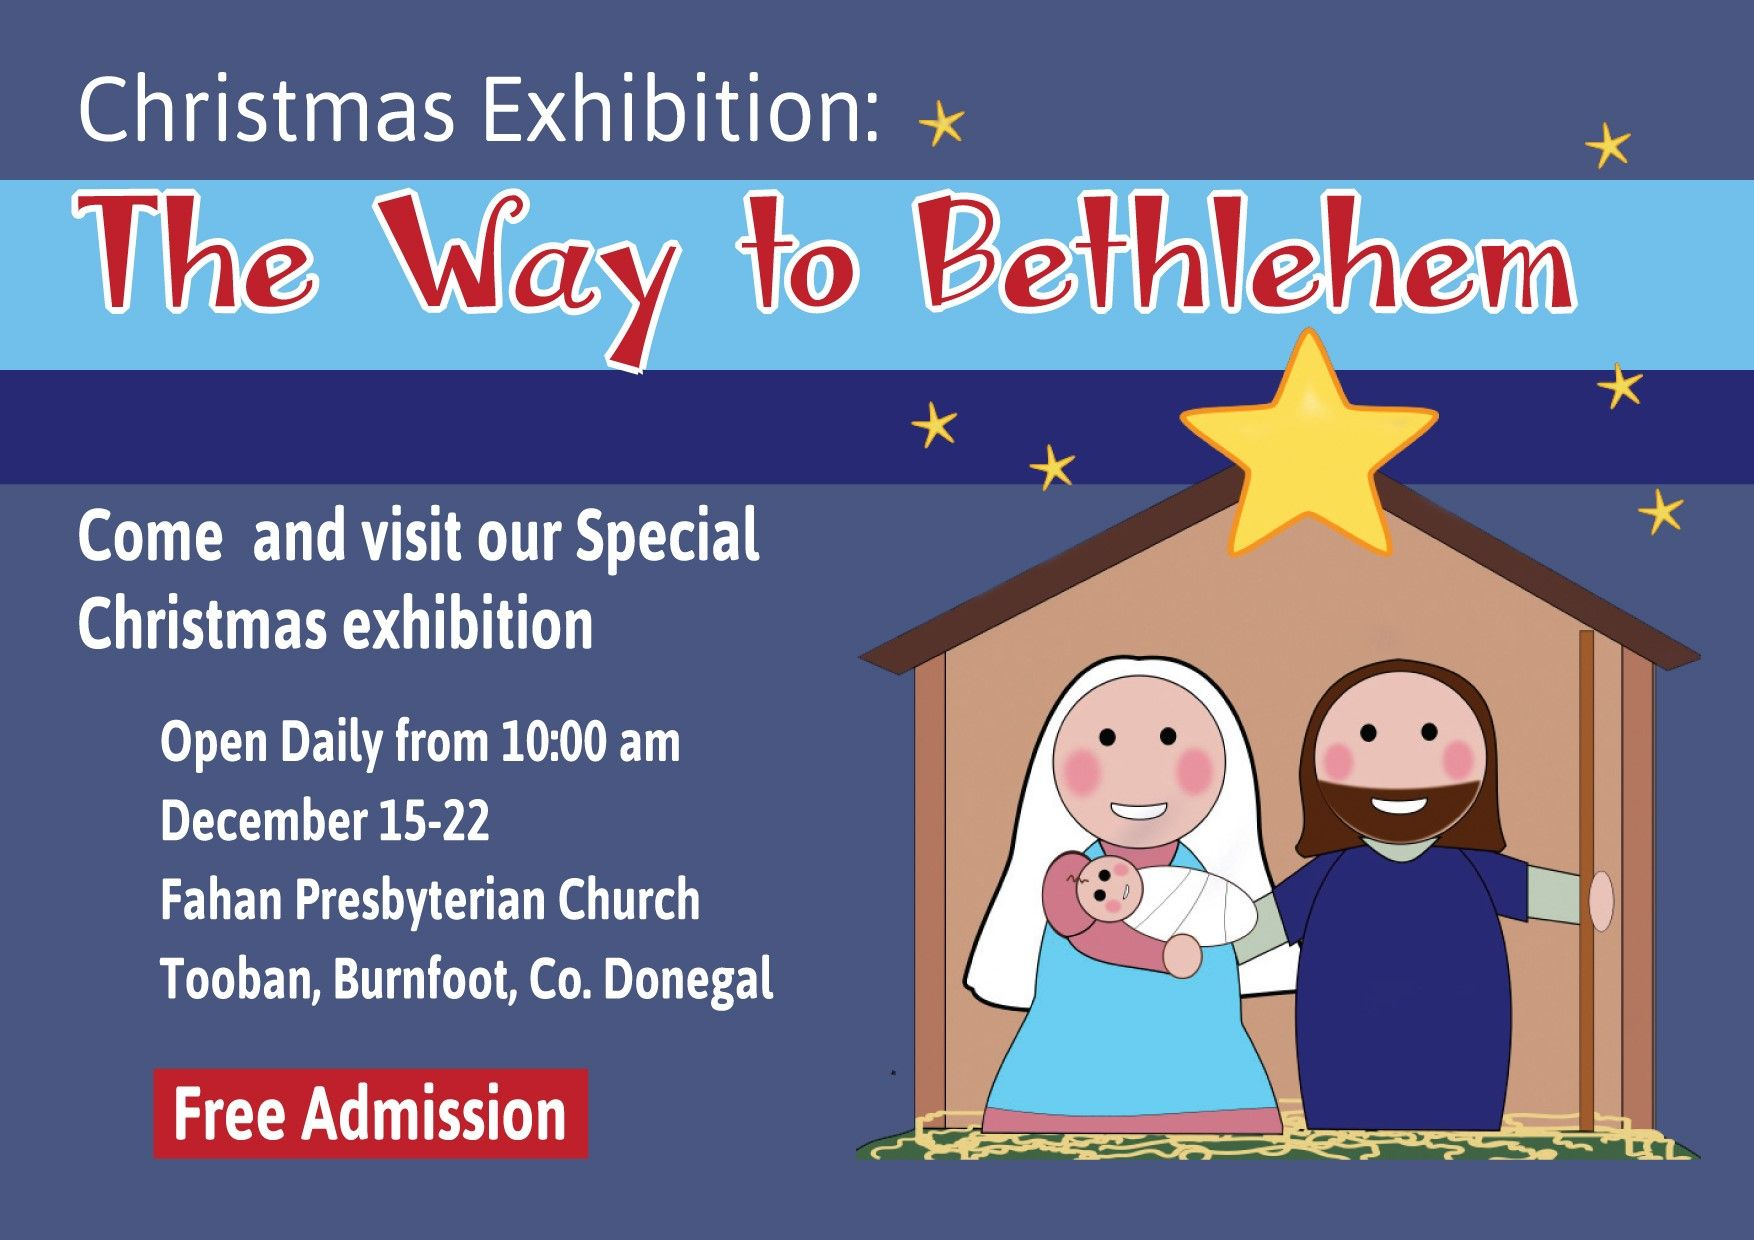 The Way to Bethlehem, December 2019